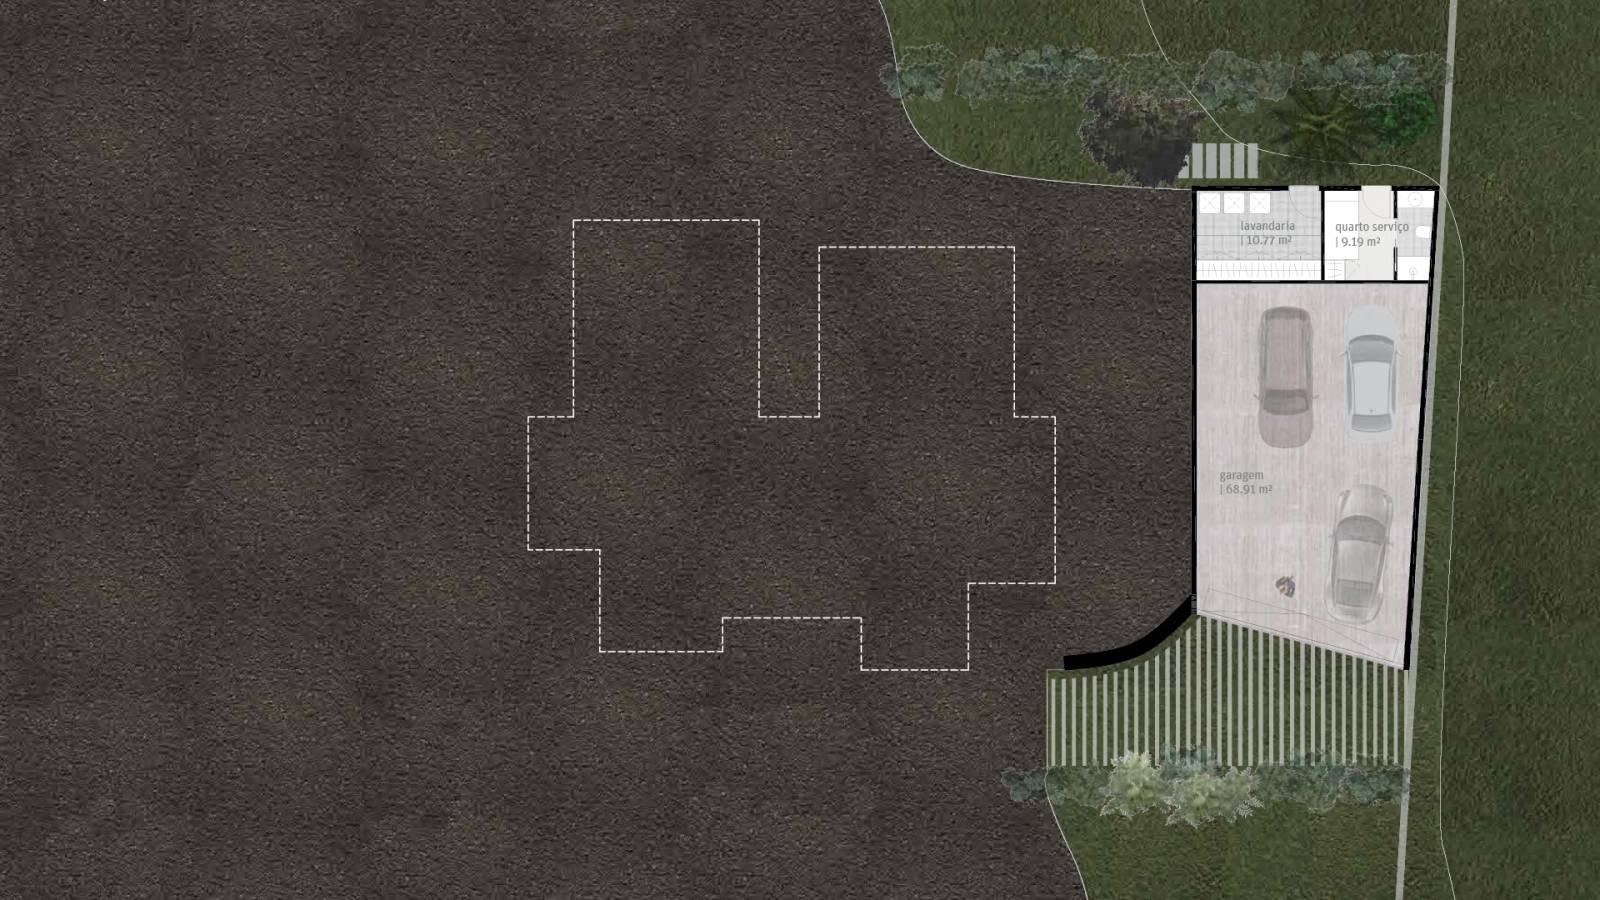 HOUSE #3 - LEVEL 1 PLAN - 6 case study houses - SPOL Architects